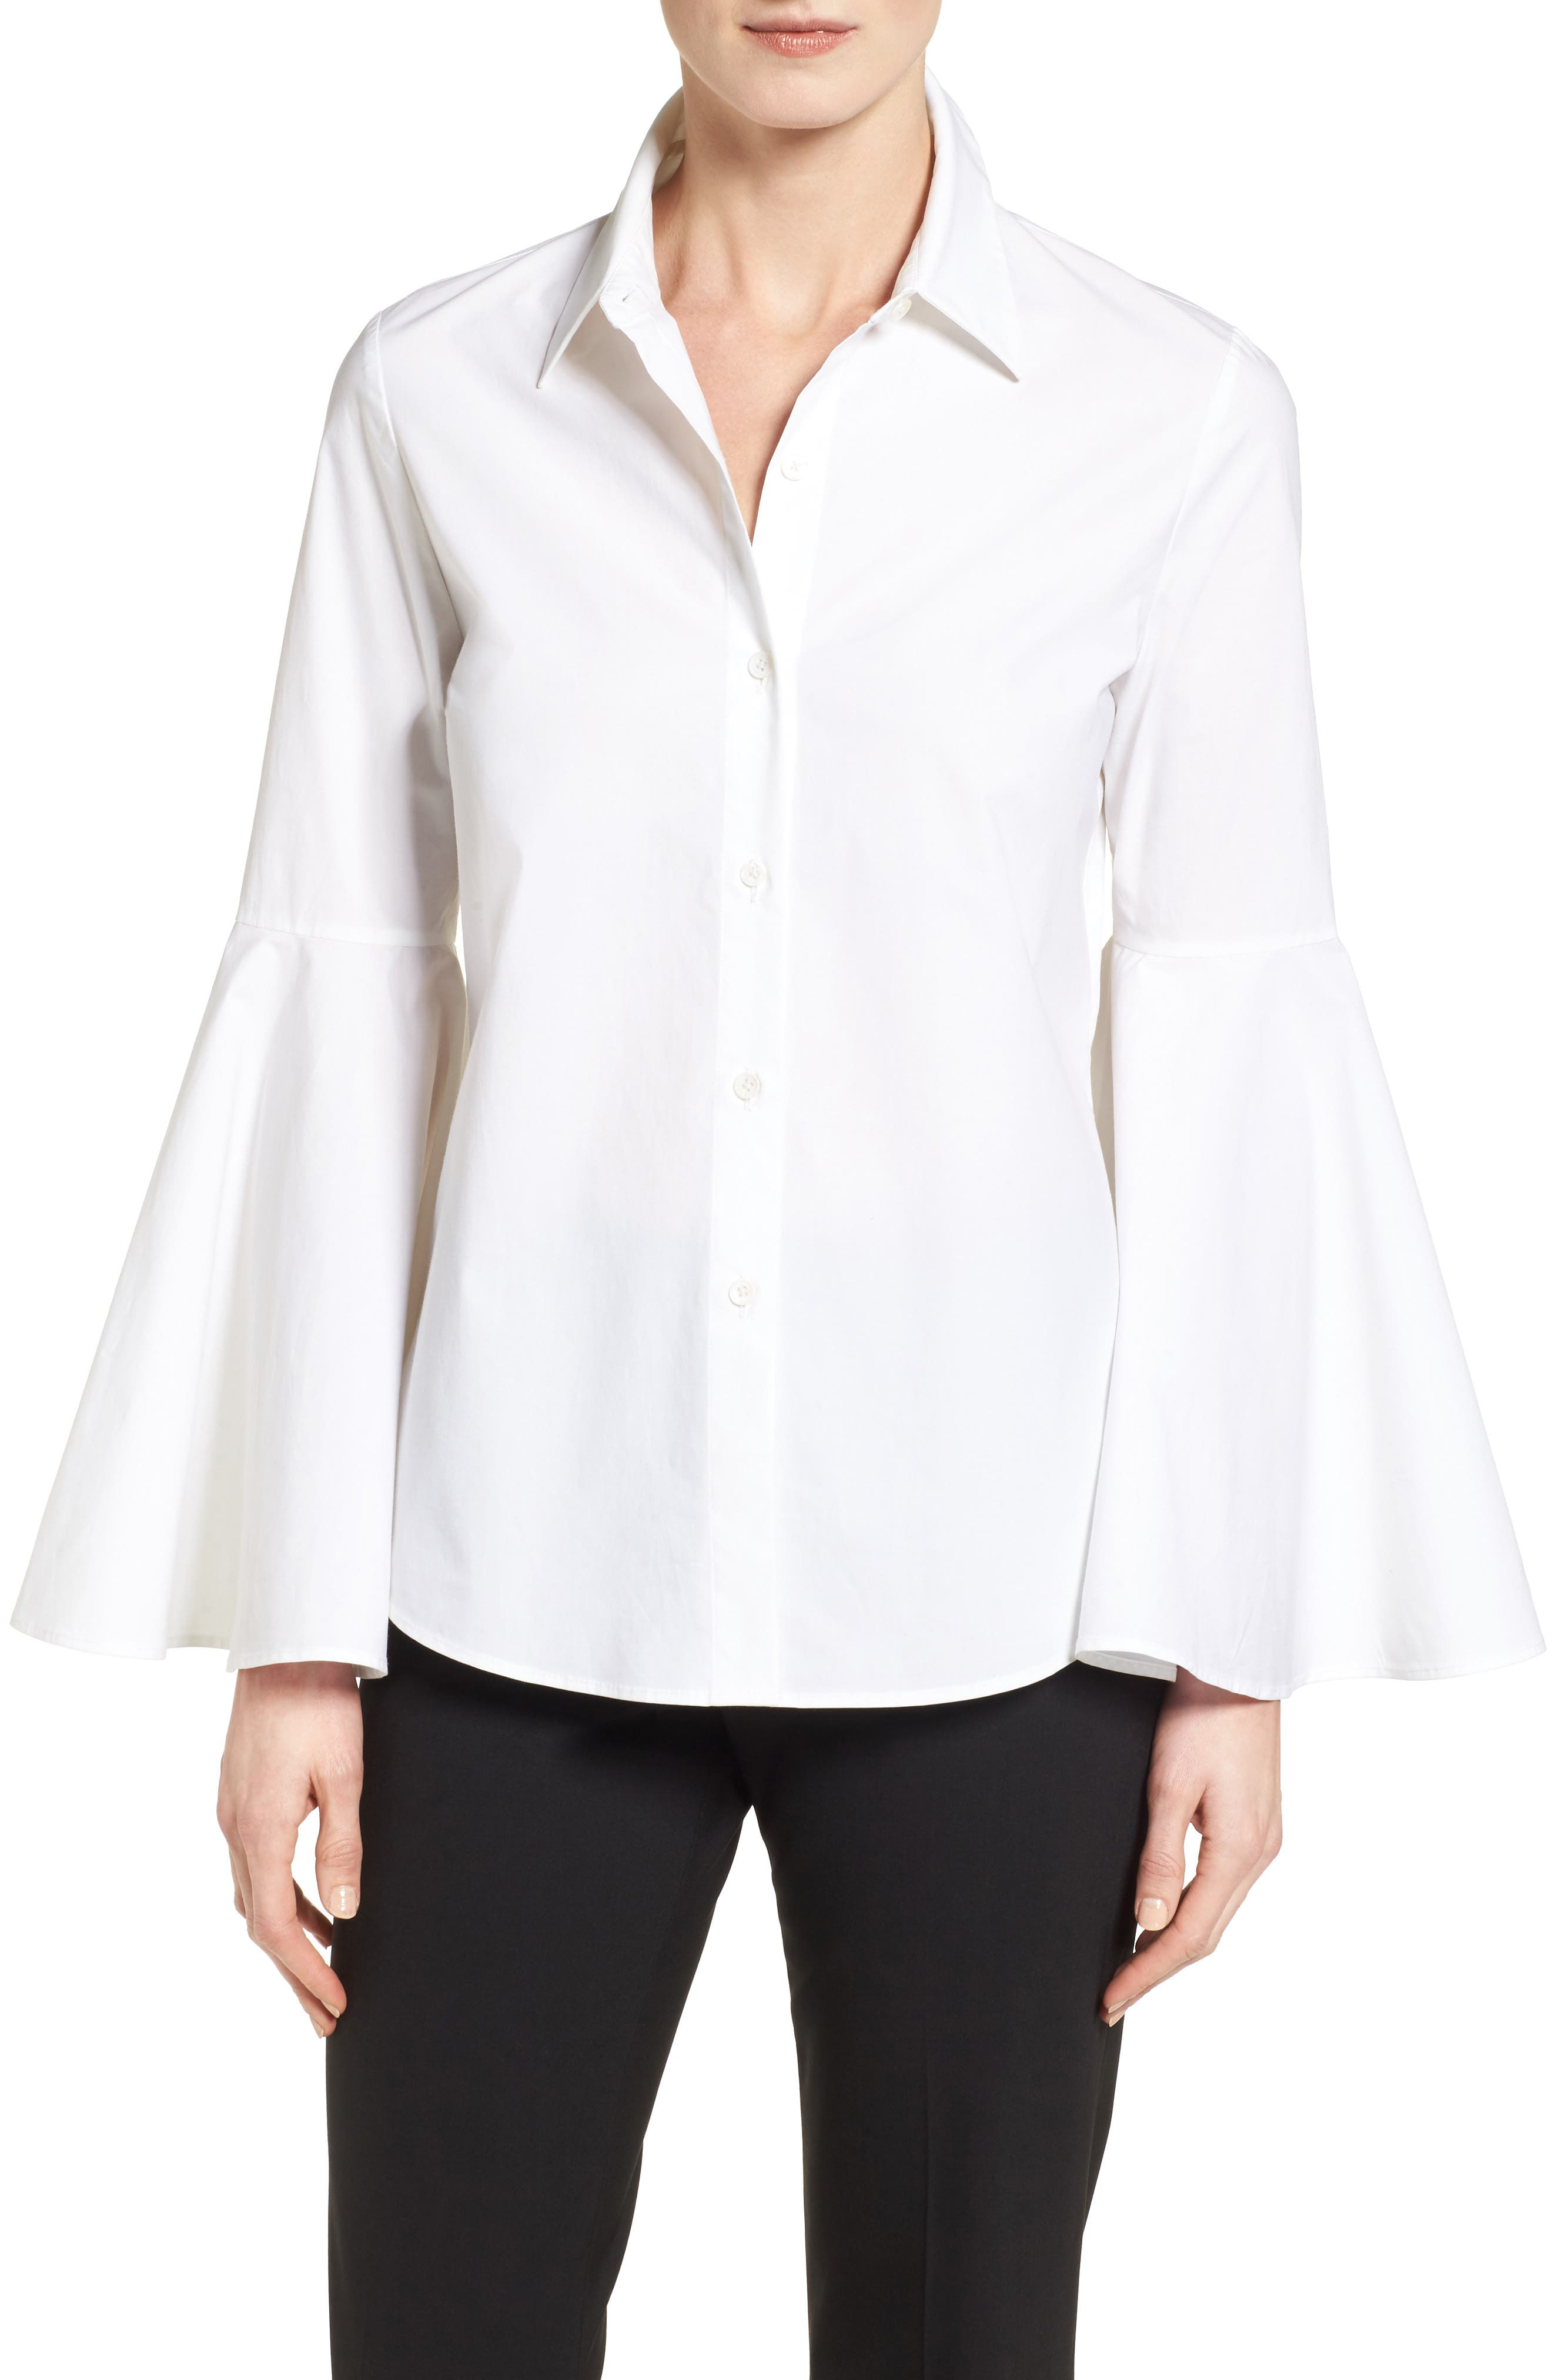 Alternate Image 1 Selected - Vince Camuto Bell Sleeve Shirt (Regular & Petite)